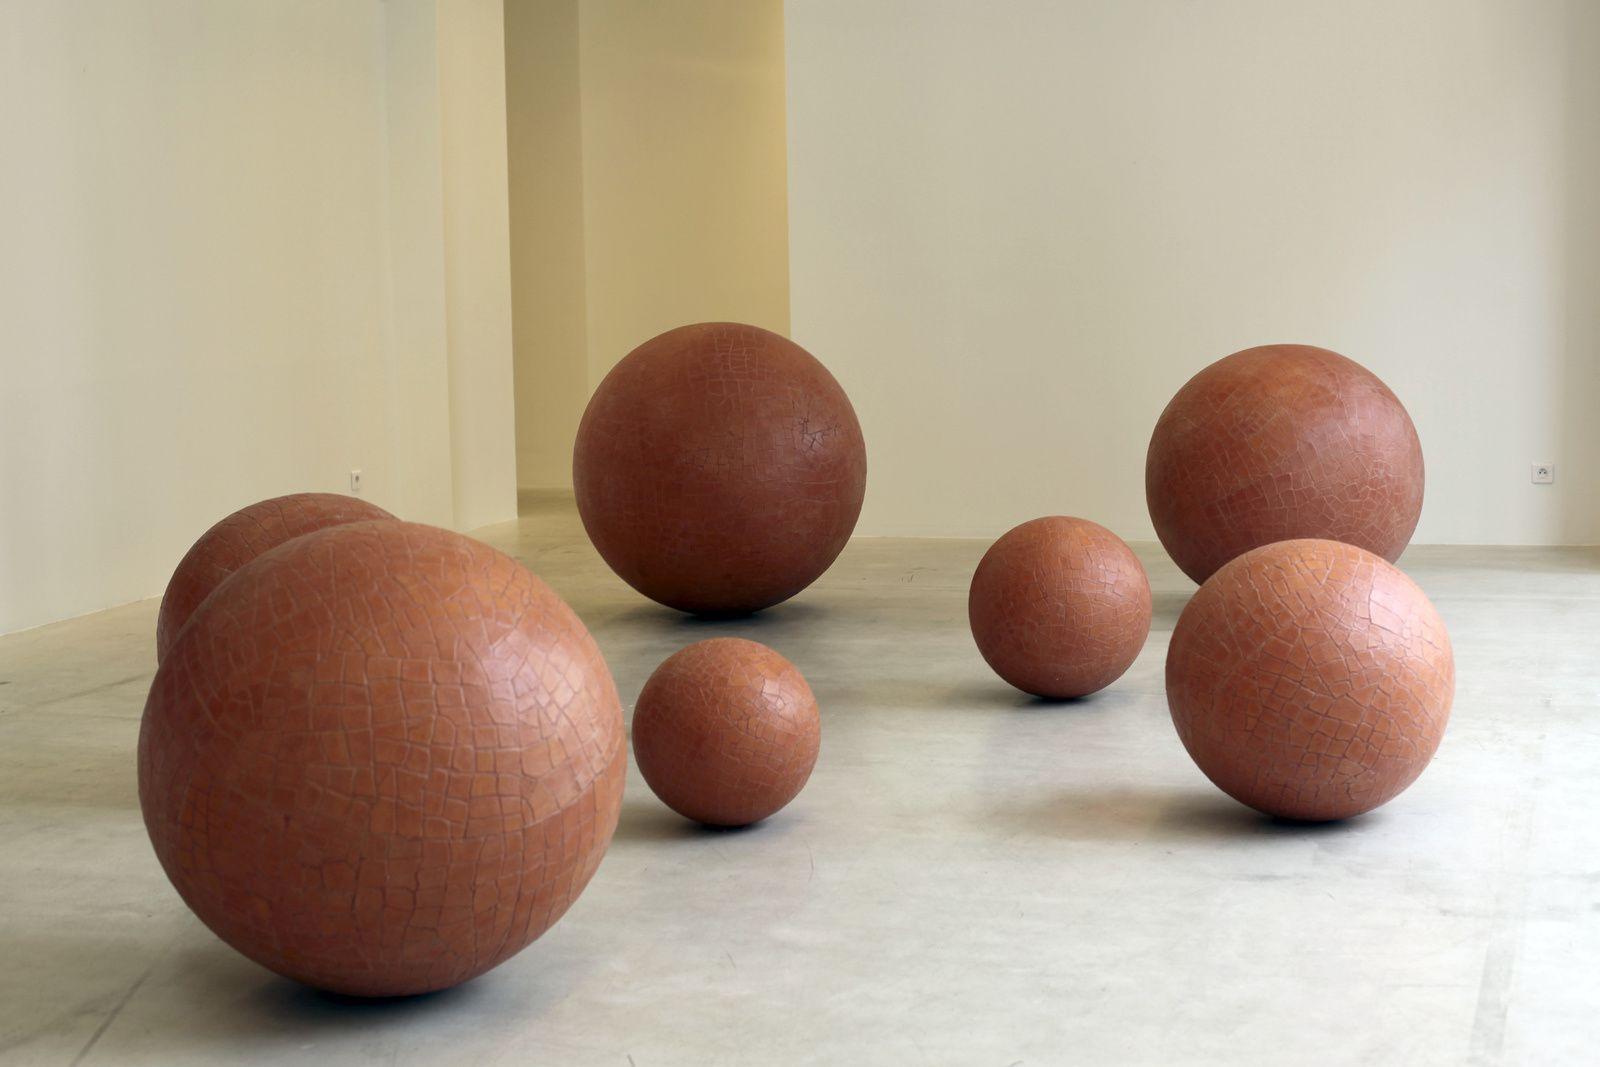 """Terre Nove"", 2017 de Luigi Mainolf - Courtesy Galerie Italienne © Photo Éric Simon"